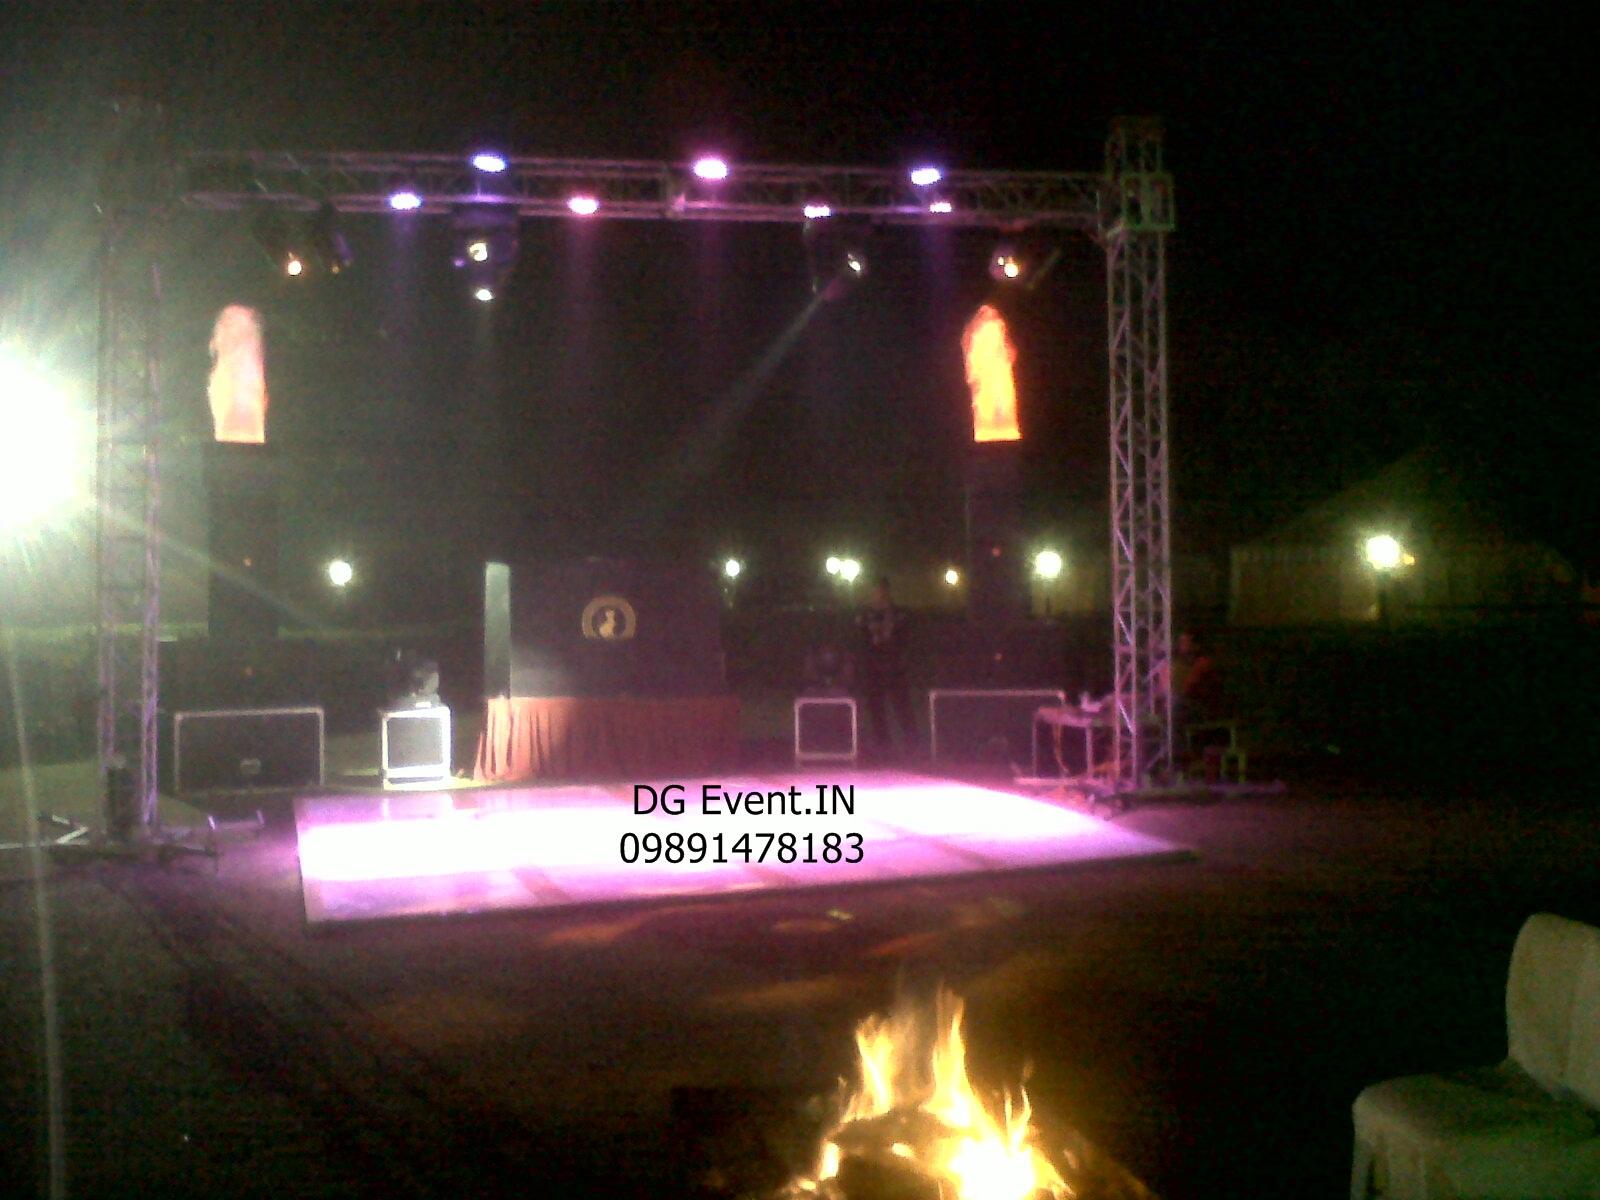 Dj videek event update best dj setup for wedding 4 side truss dj setup best dj setup for wedding 4 side truss dj setup junglespirit Choice Image